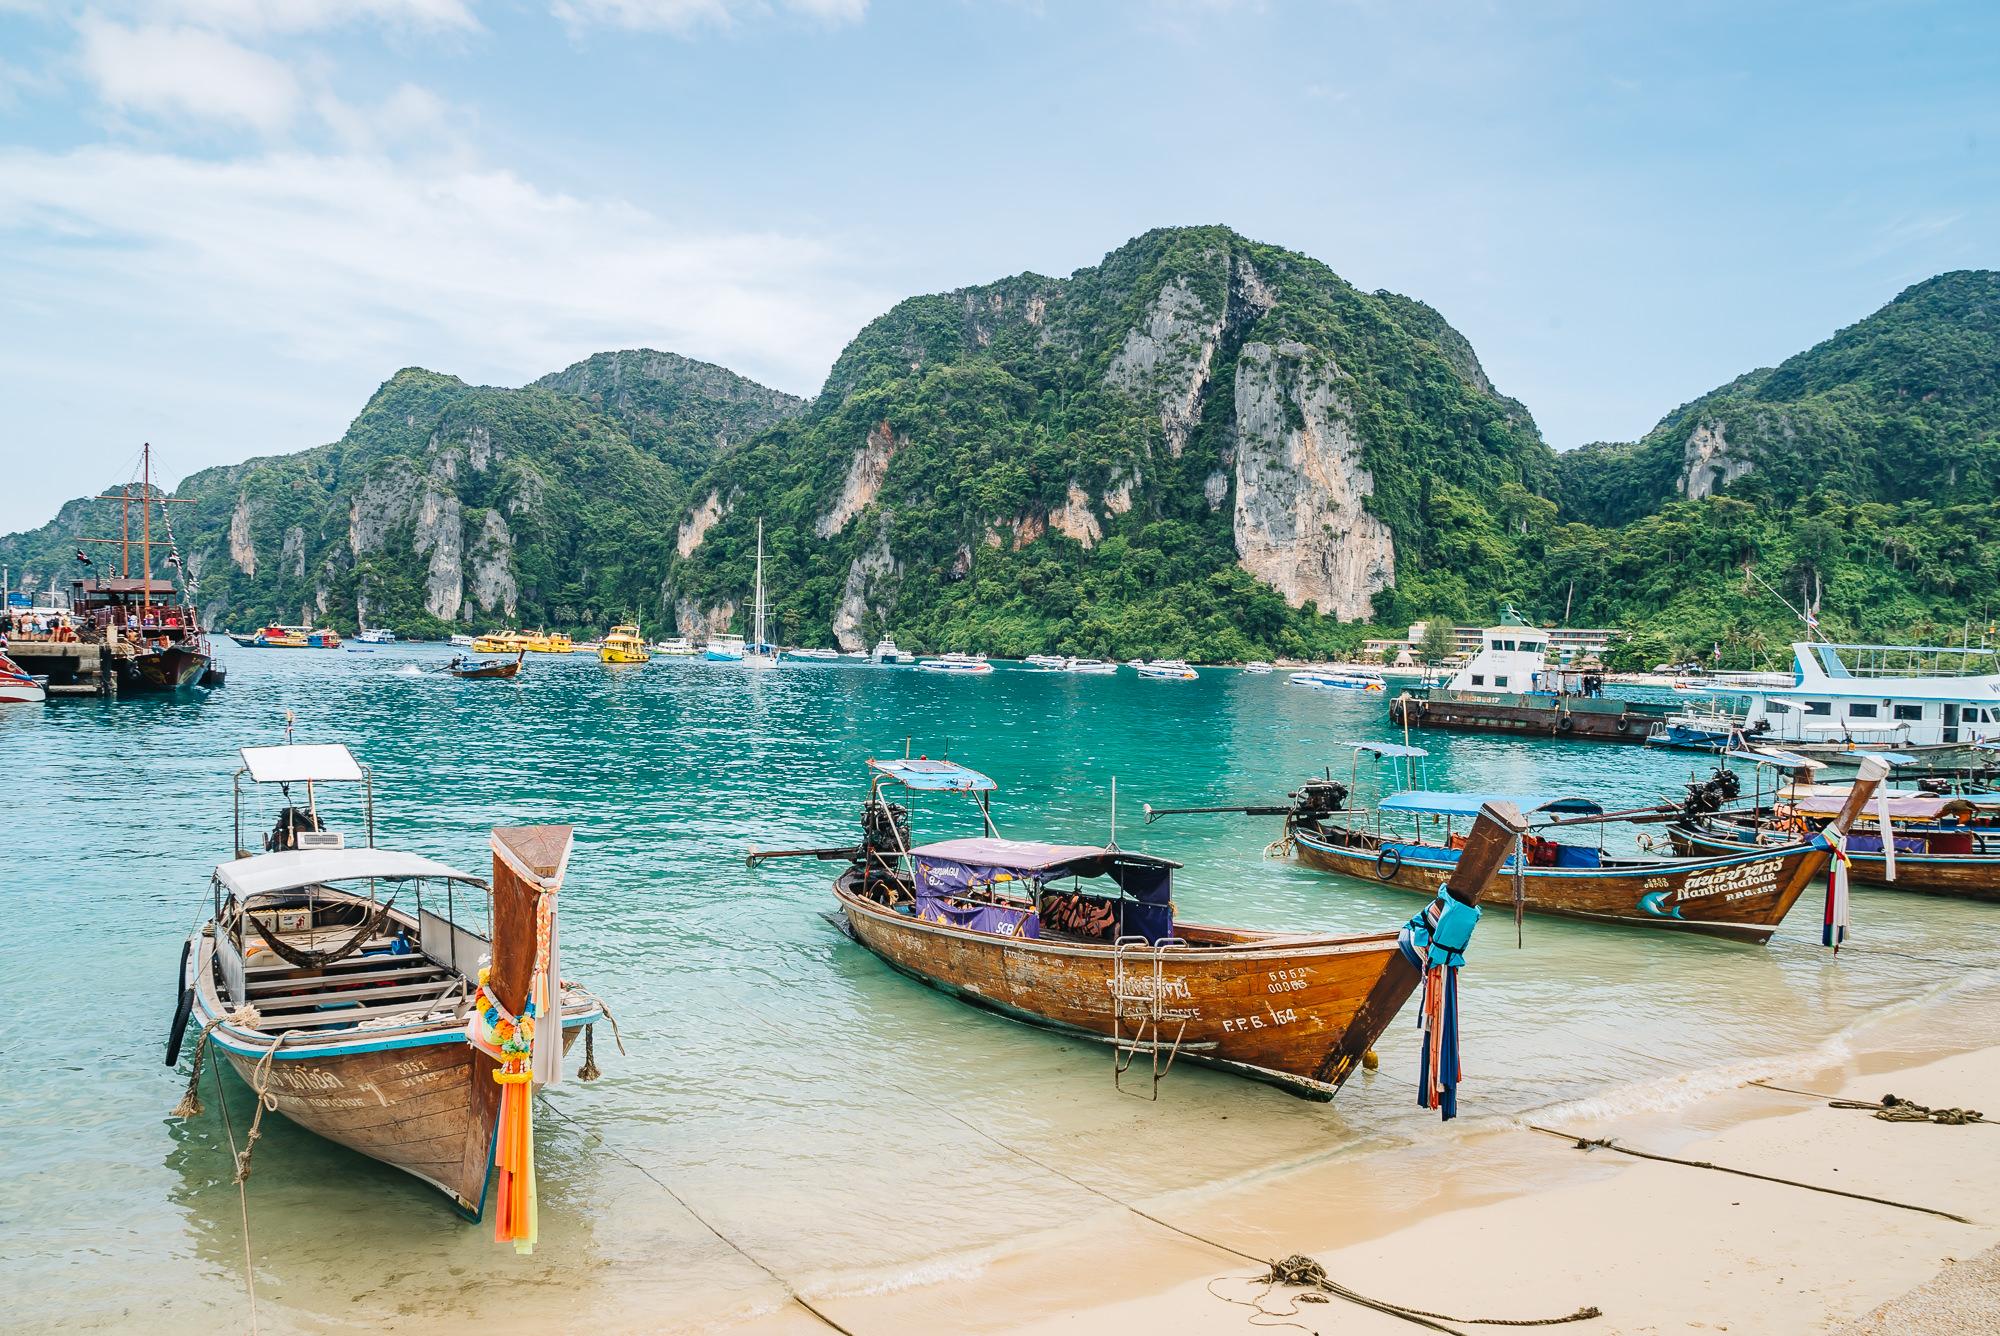 Classic Thai boats of Phi Phi Islands